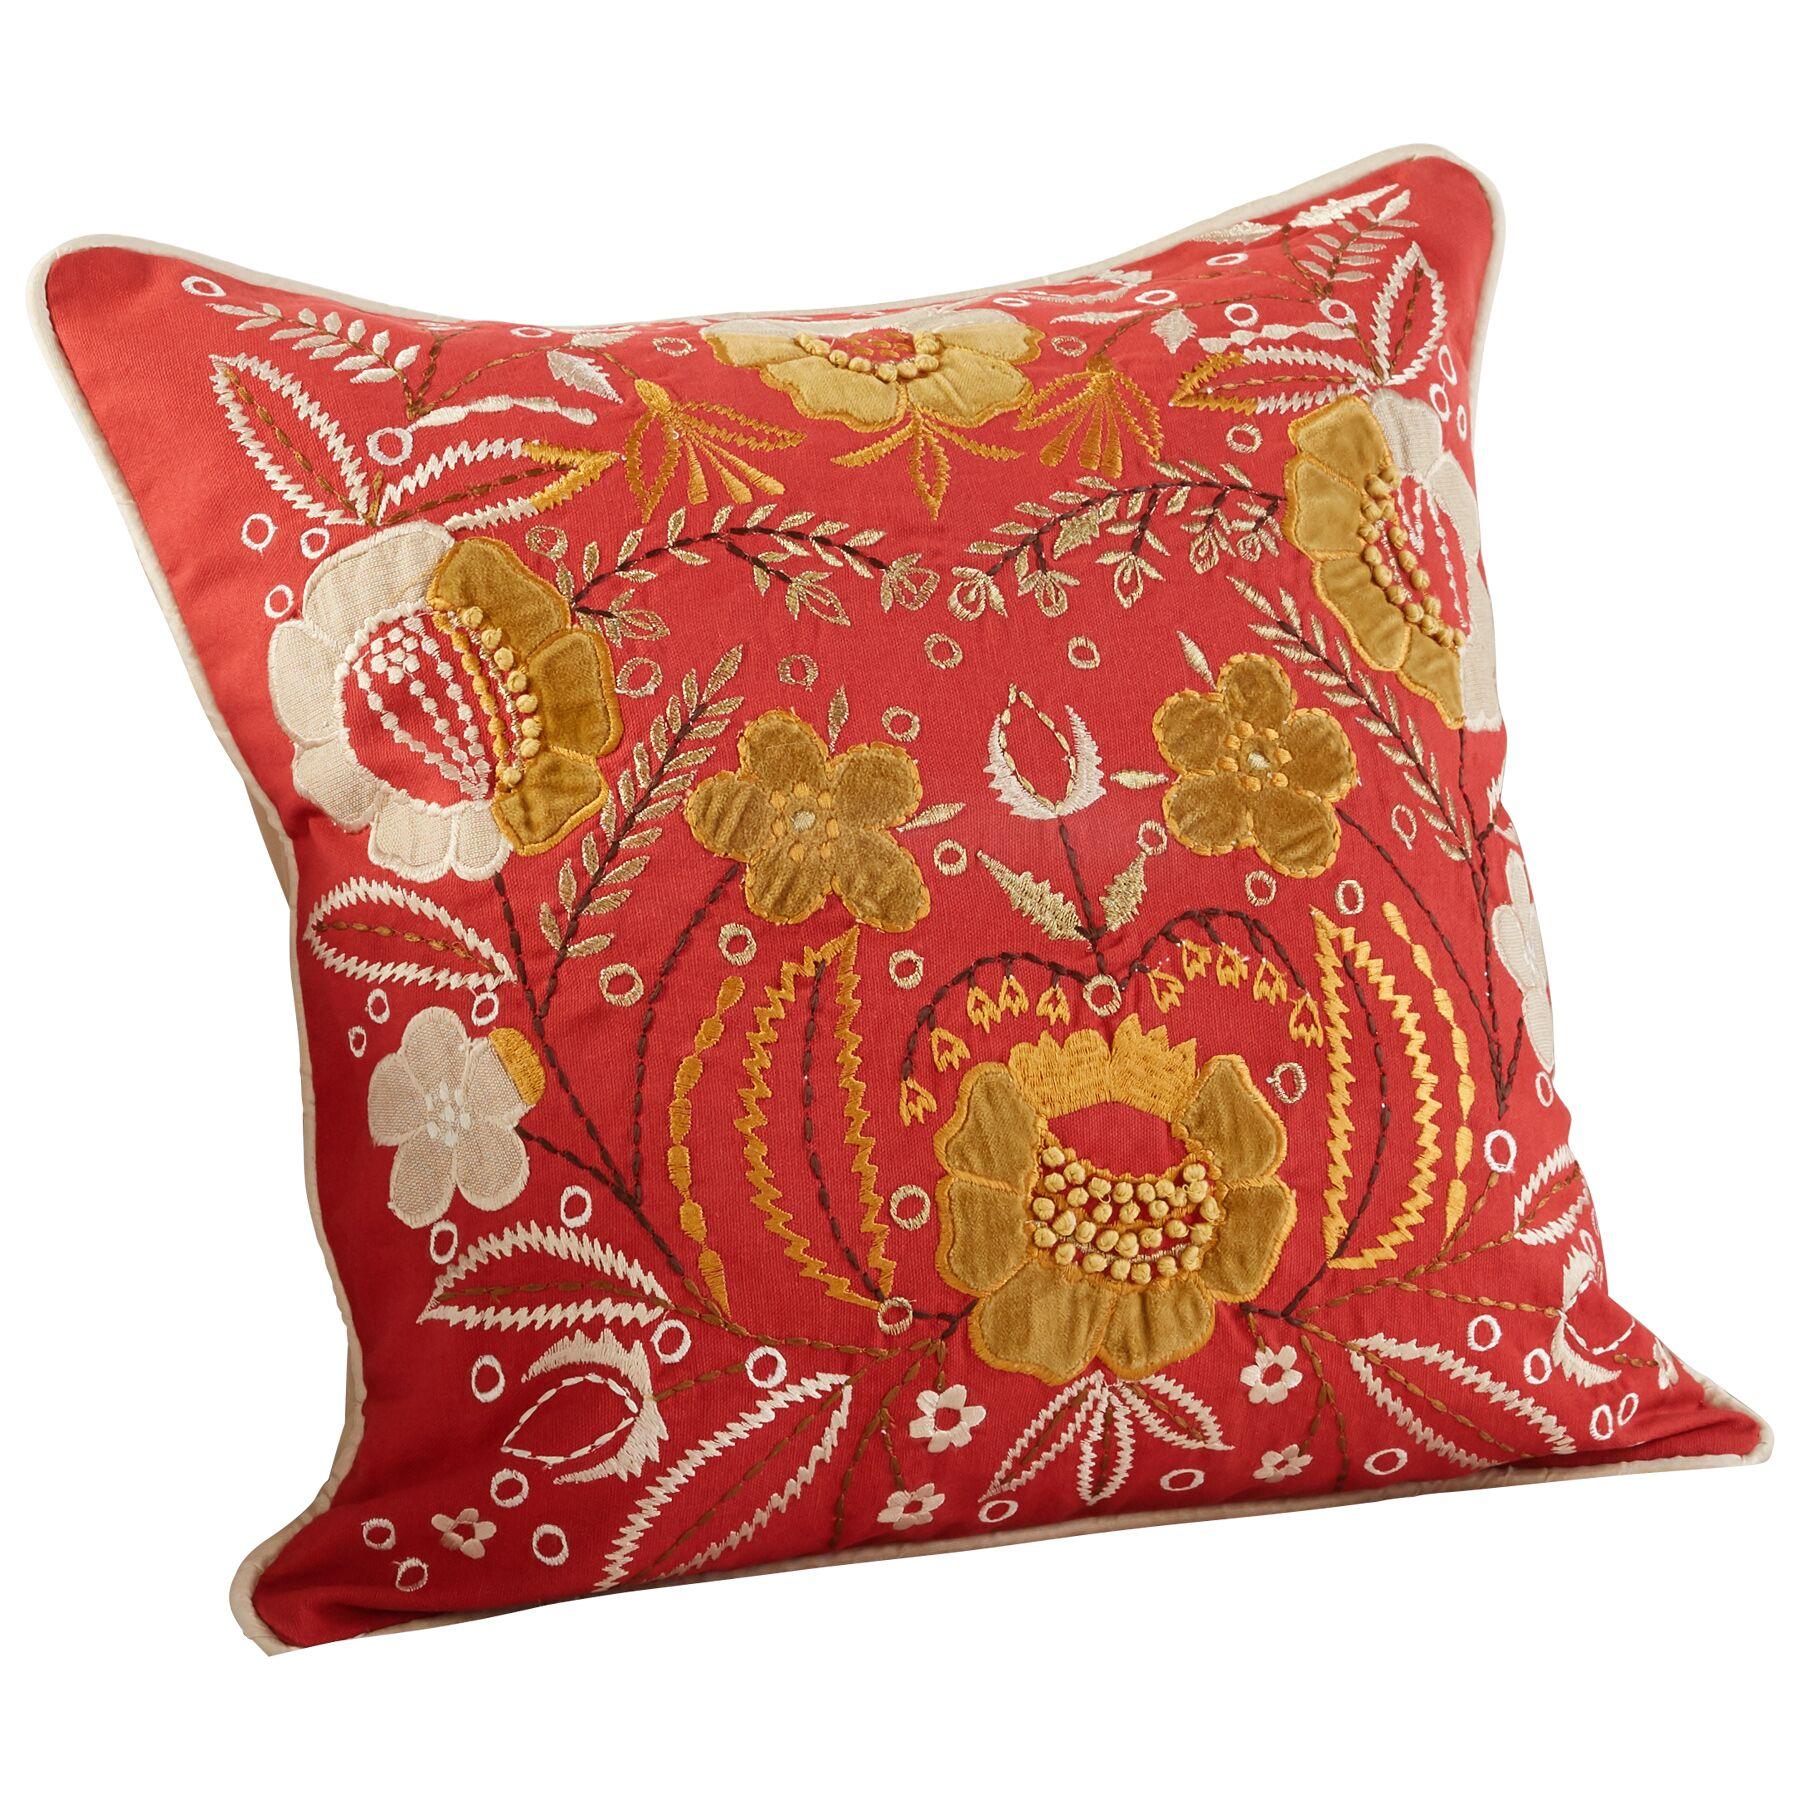 Frida Decorative Cotton Throw Pillow